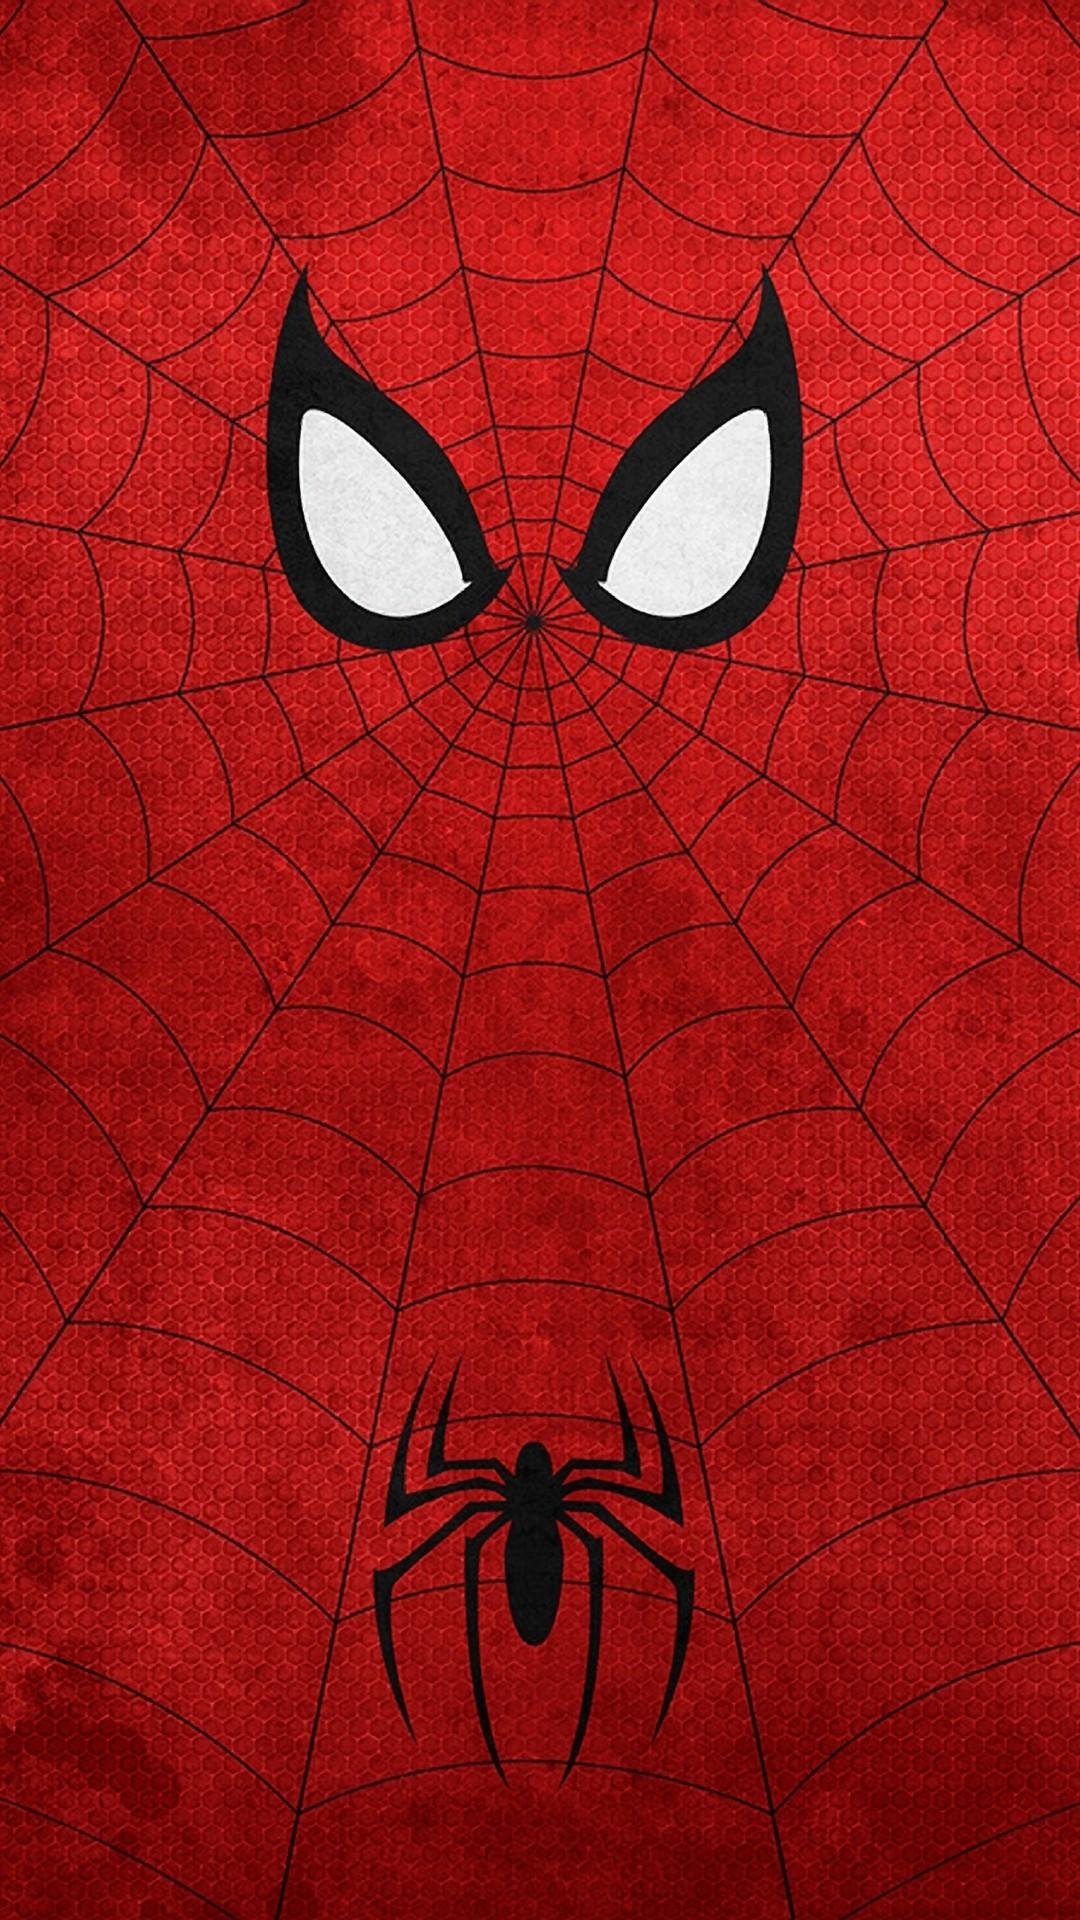 Spiderman Neon Red Wallpaper